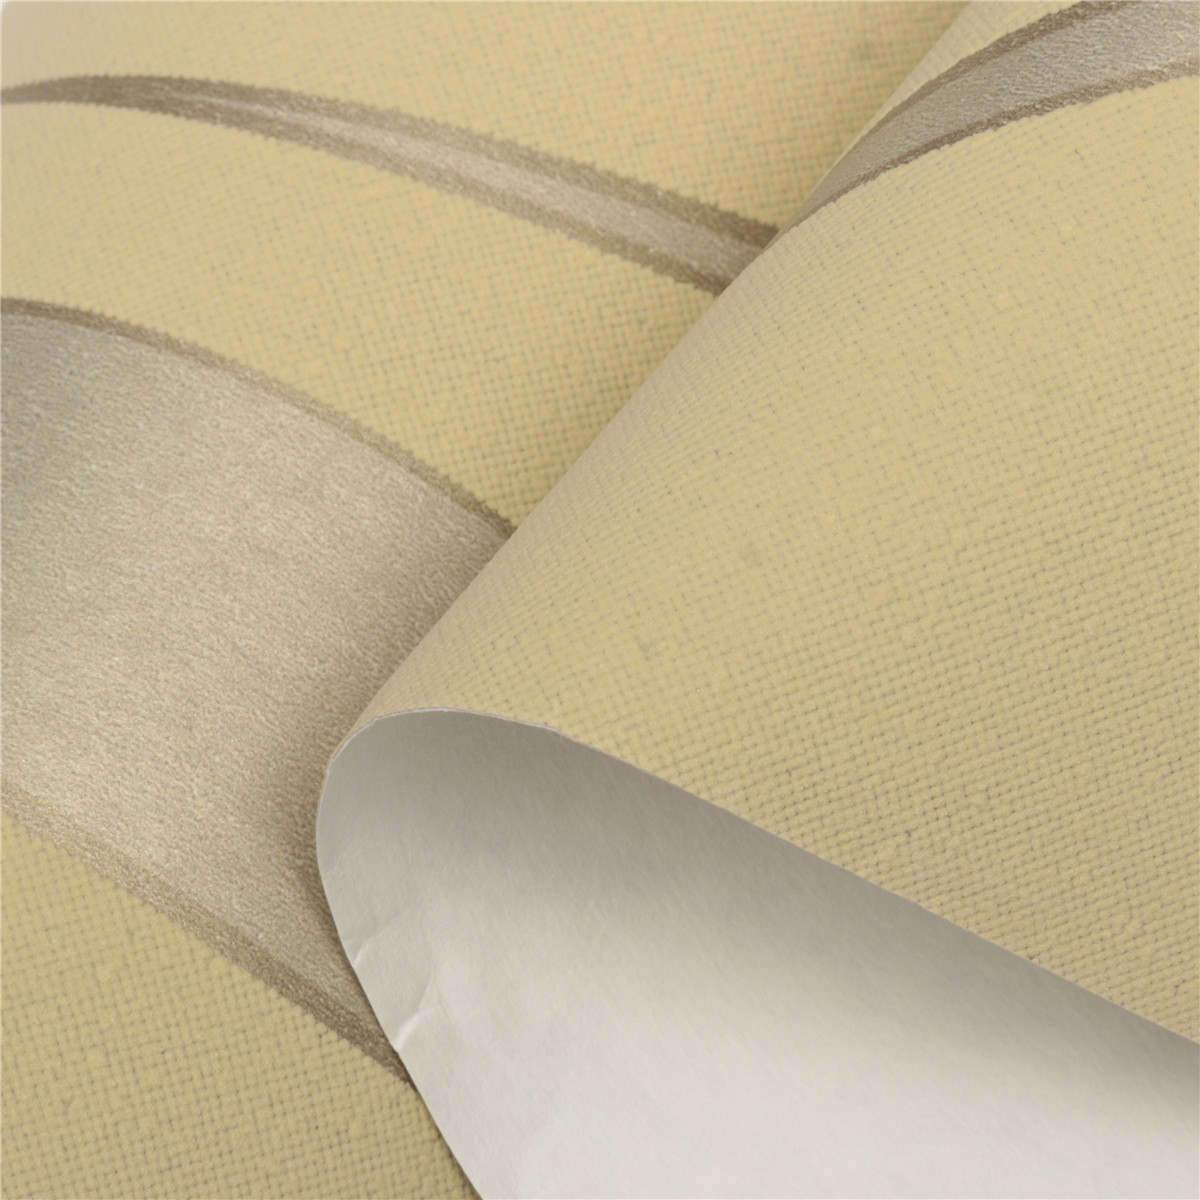 3d Wave Flocking Wallpaper 10m 3d Crescent Wave Stripes Embossed Non Woven Flocking